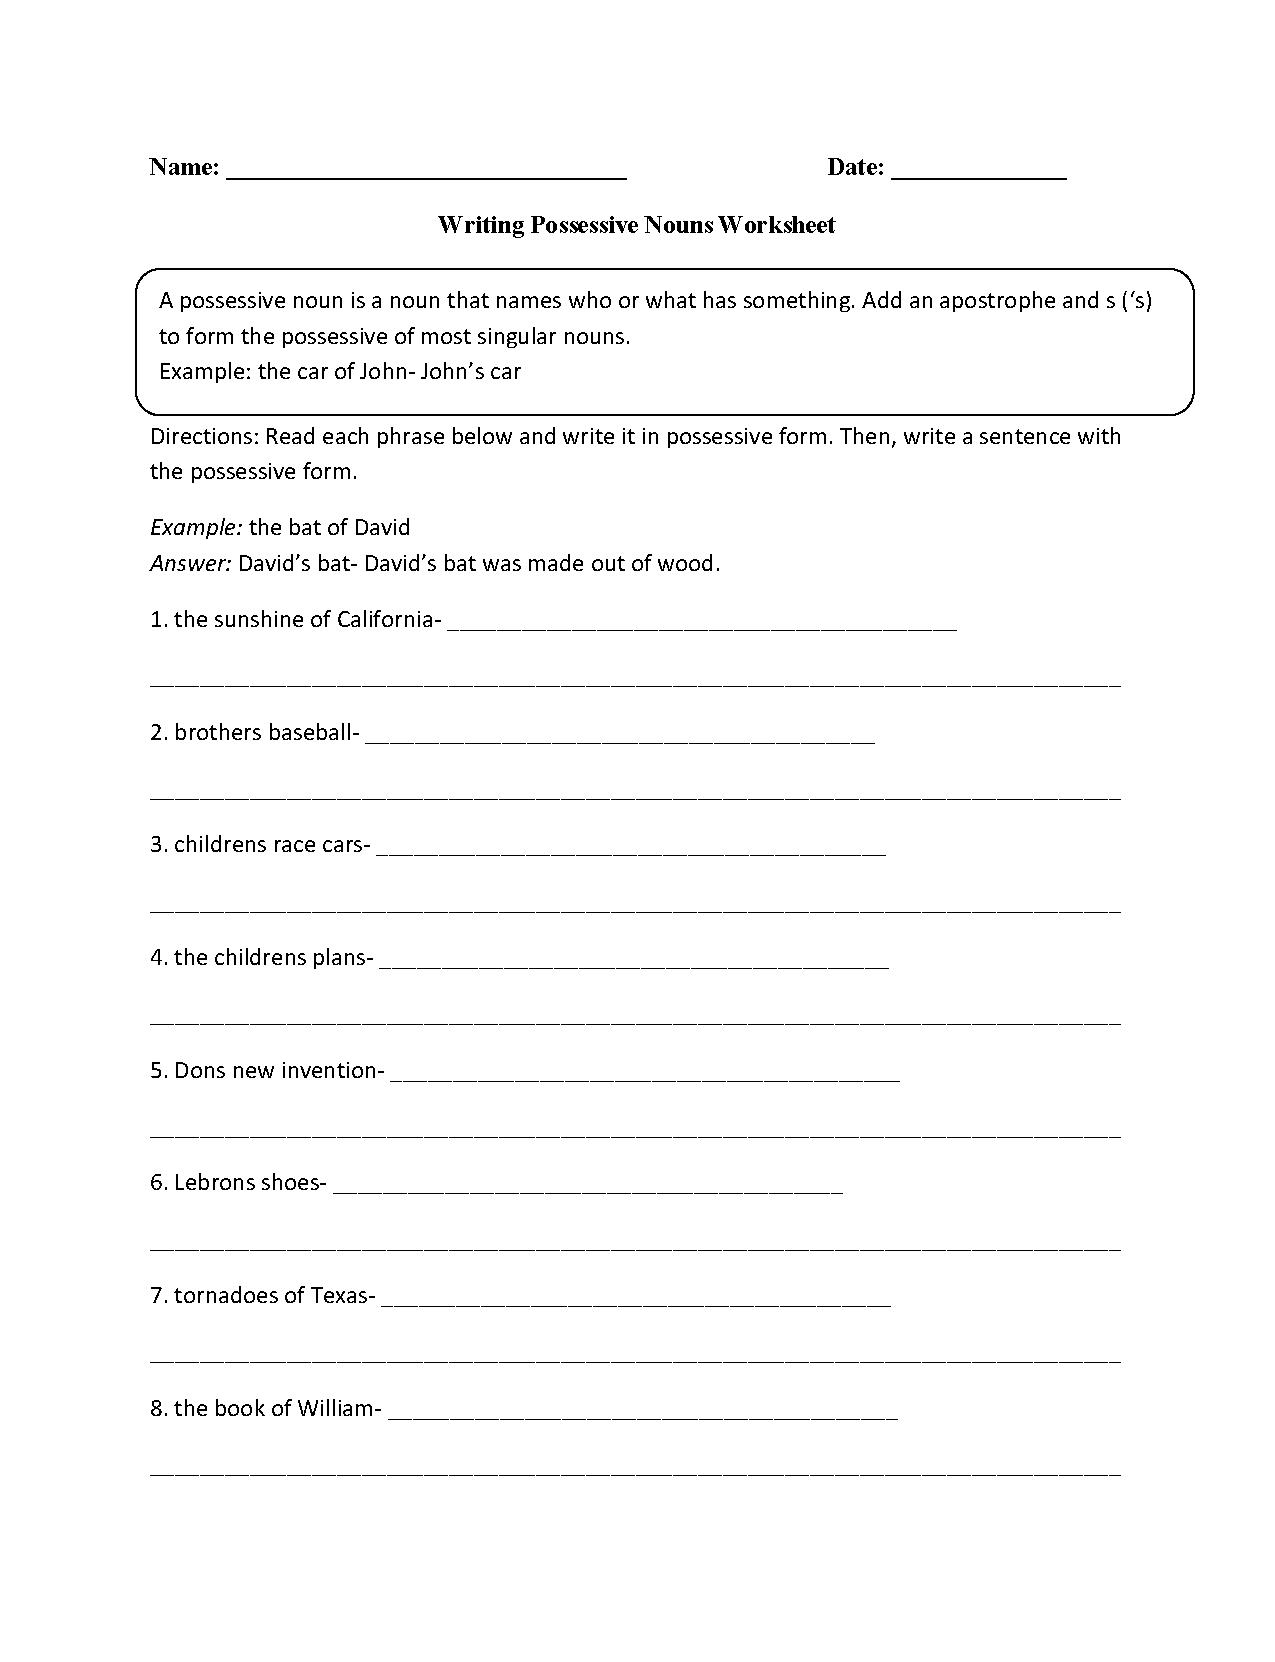 medium resolution of Writing with Possessive Nouns Worksheet   Nouns worksheet